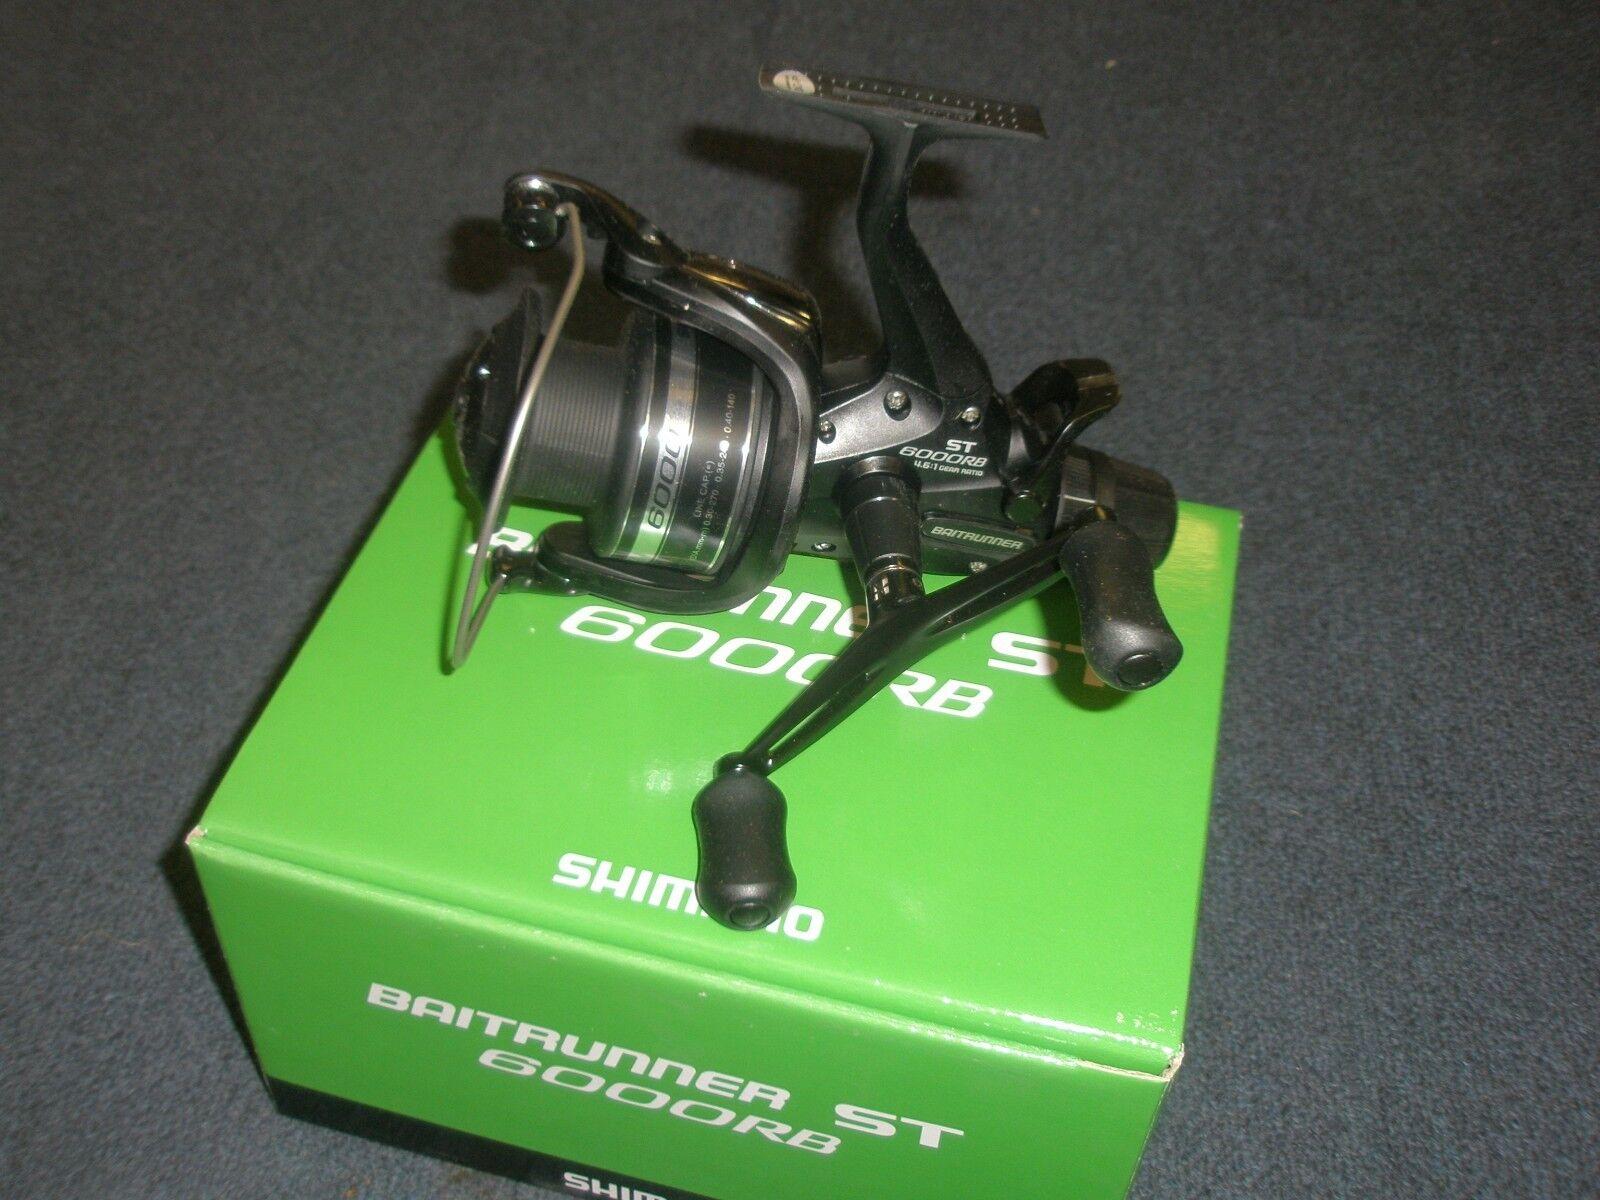 Shimano free spool reels St. 6000 RB role carp fishing equipSiet